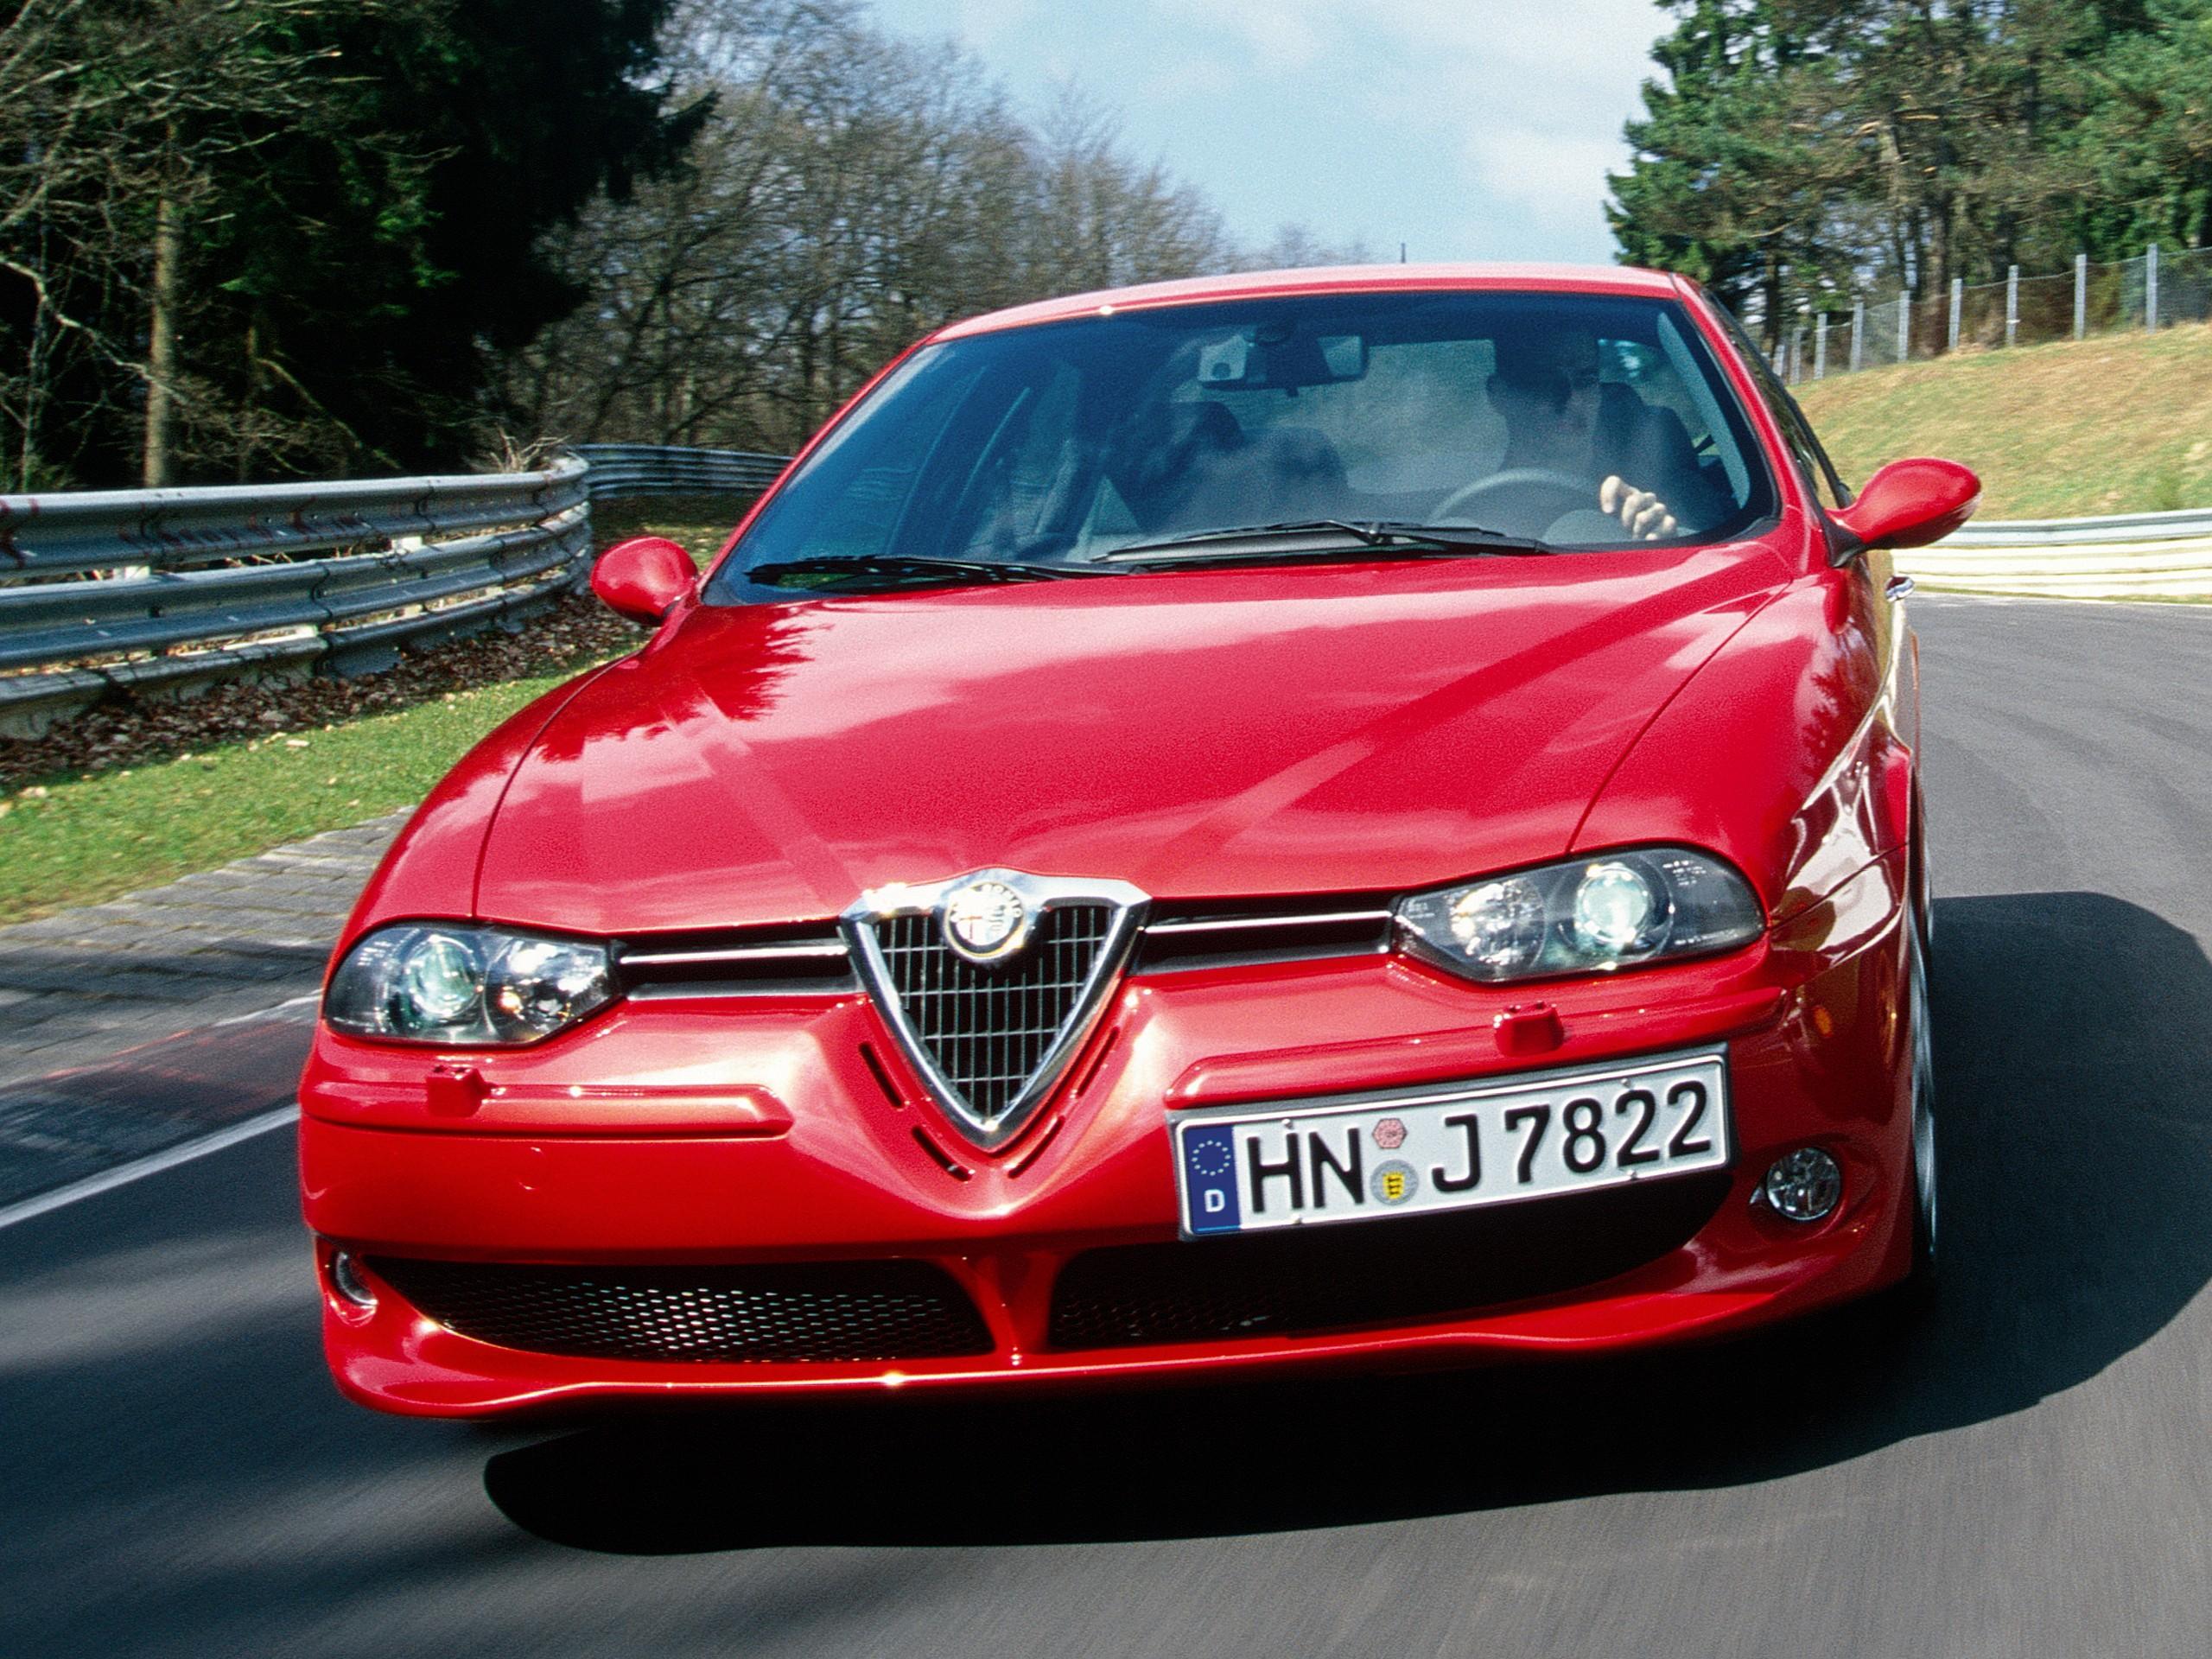 ALFA ROMEO 156 GTA specs - 2001, 2002, 2003, 2004, 2005 - autoevolution